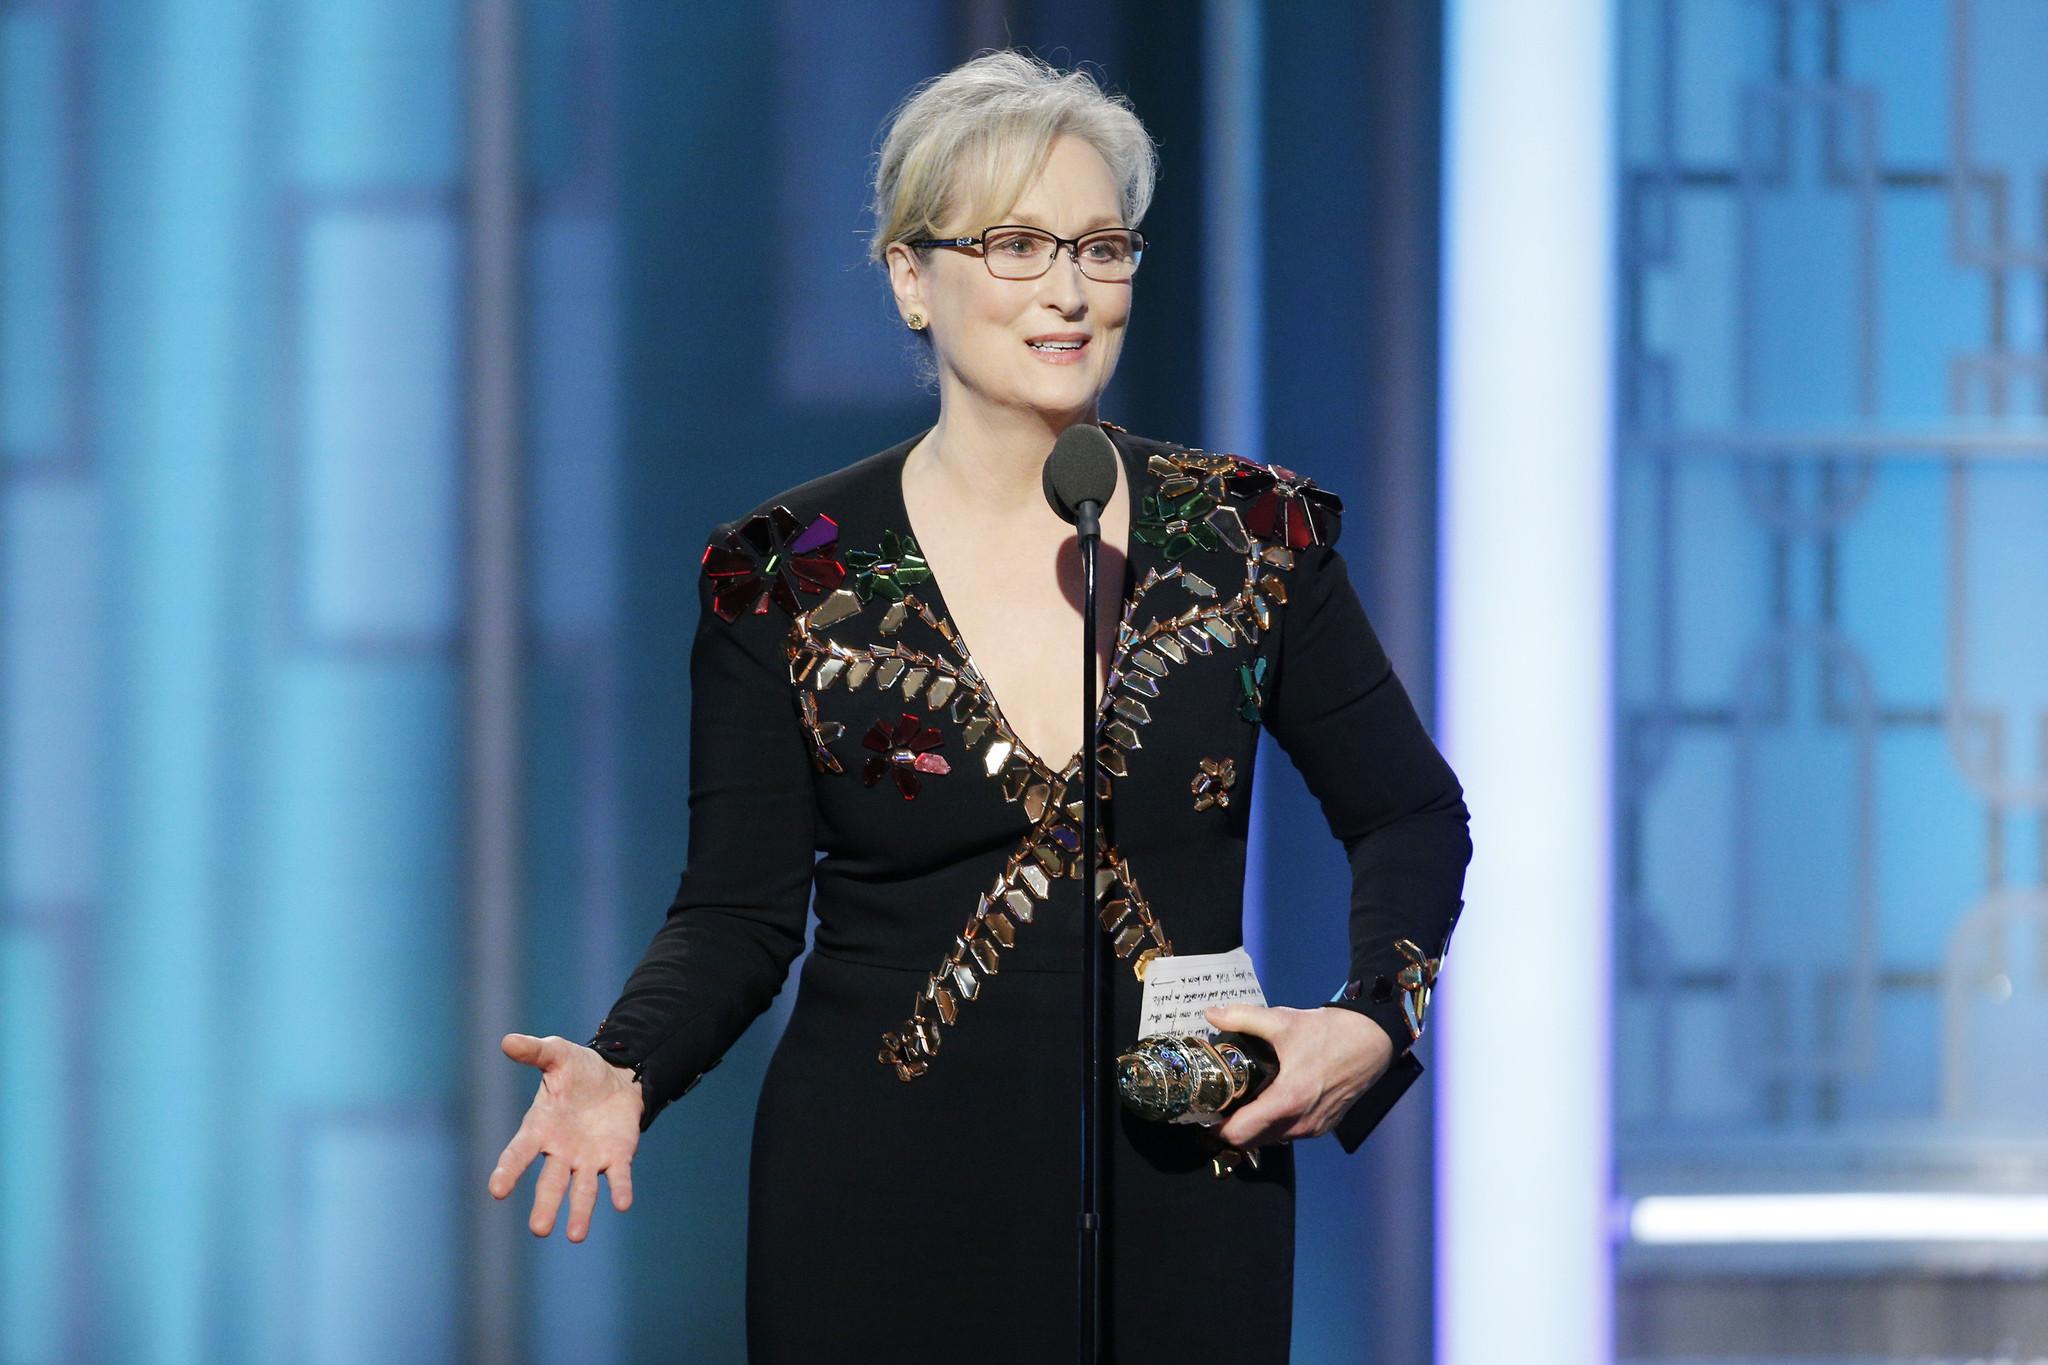 b09980fb3baa6 Meryl Streep accepts the Cecil B. DeMille Lifetime Achievement Award on  Jan. 8 at